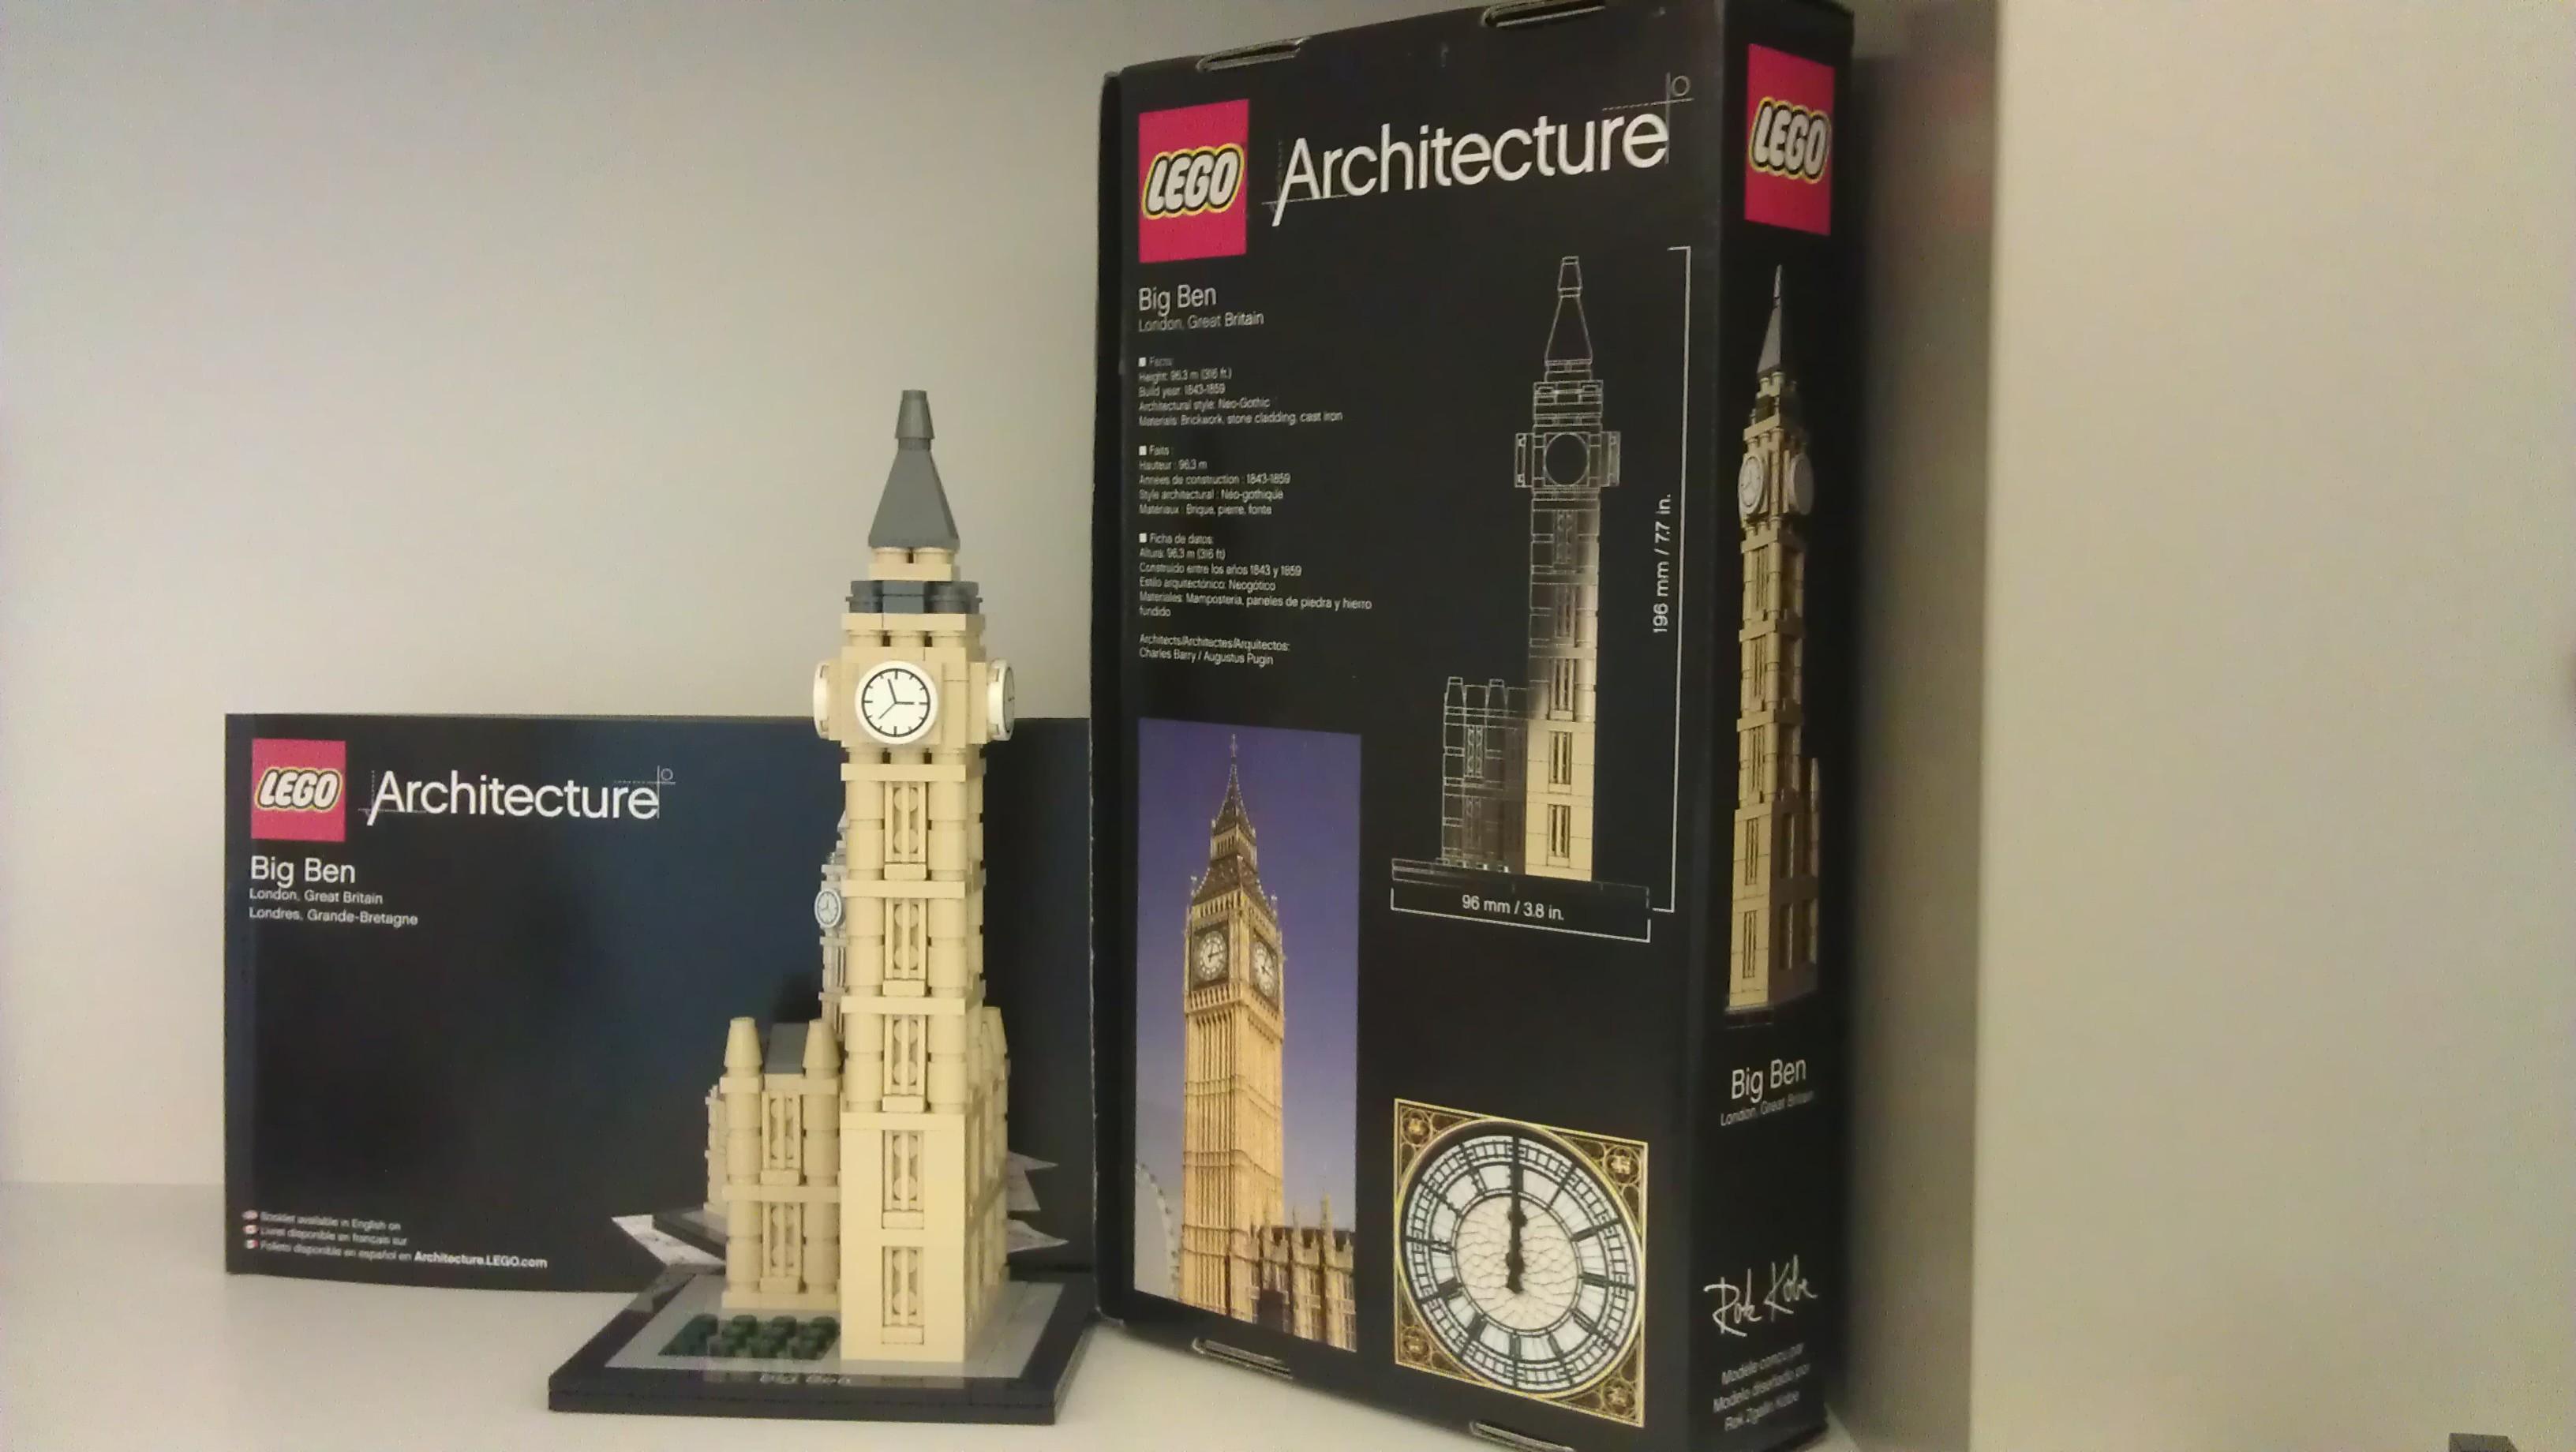 Lego Architecture Big Ben | Lego 21013 Big Ben Hello27 Net